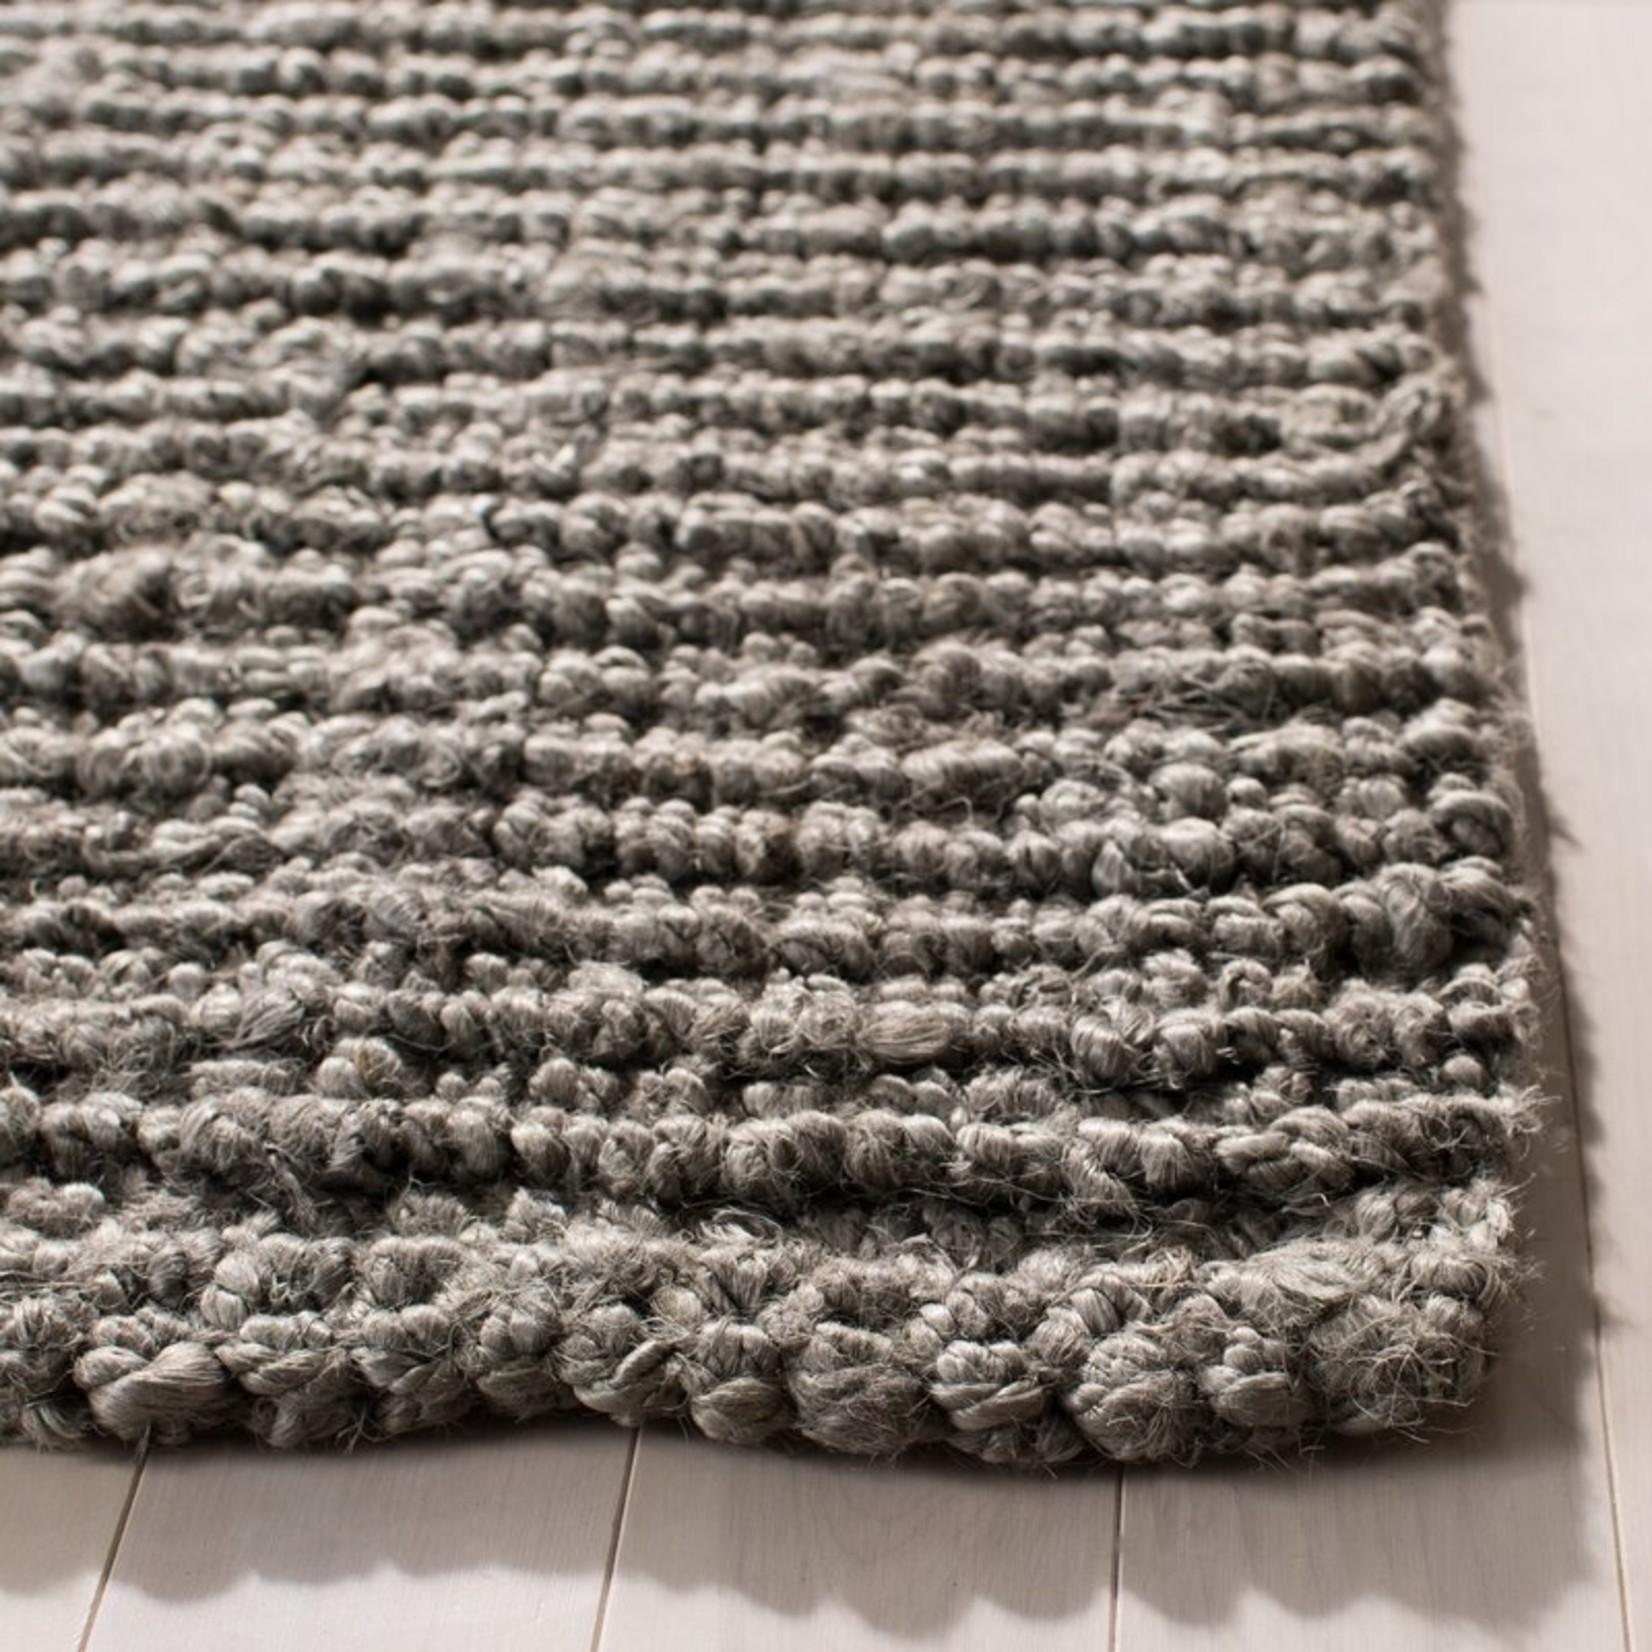 *4' x 4' Square - Jeremy Handwoven Jute Light Gray Area Rug